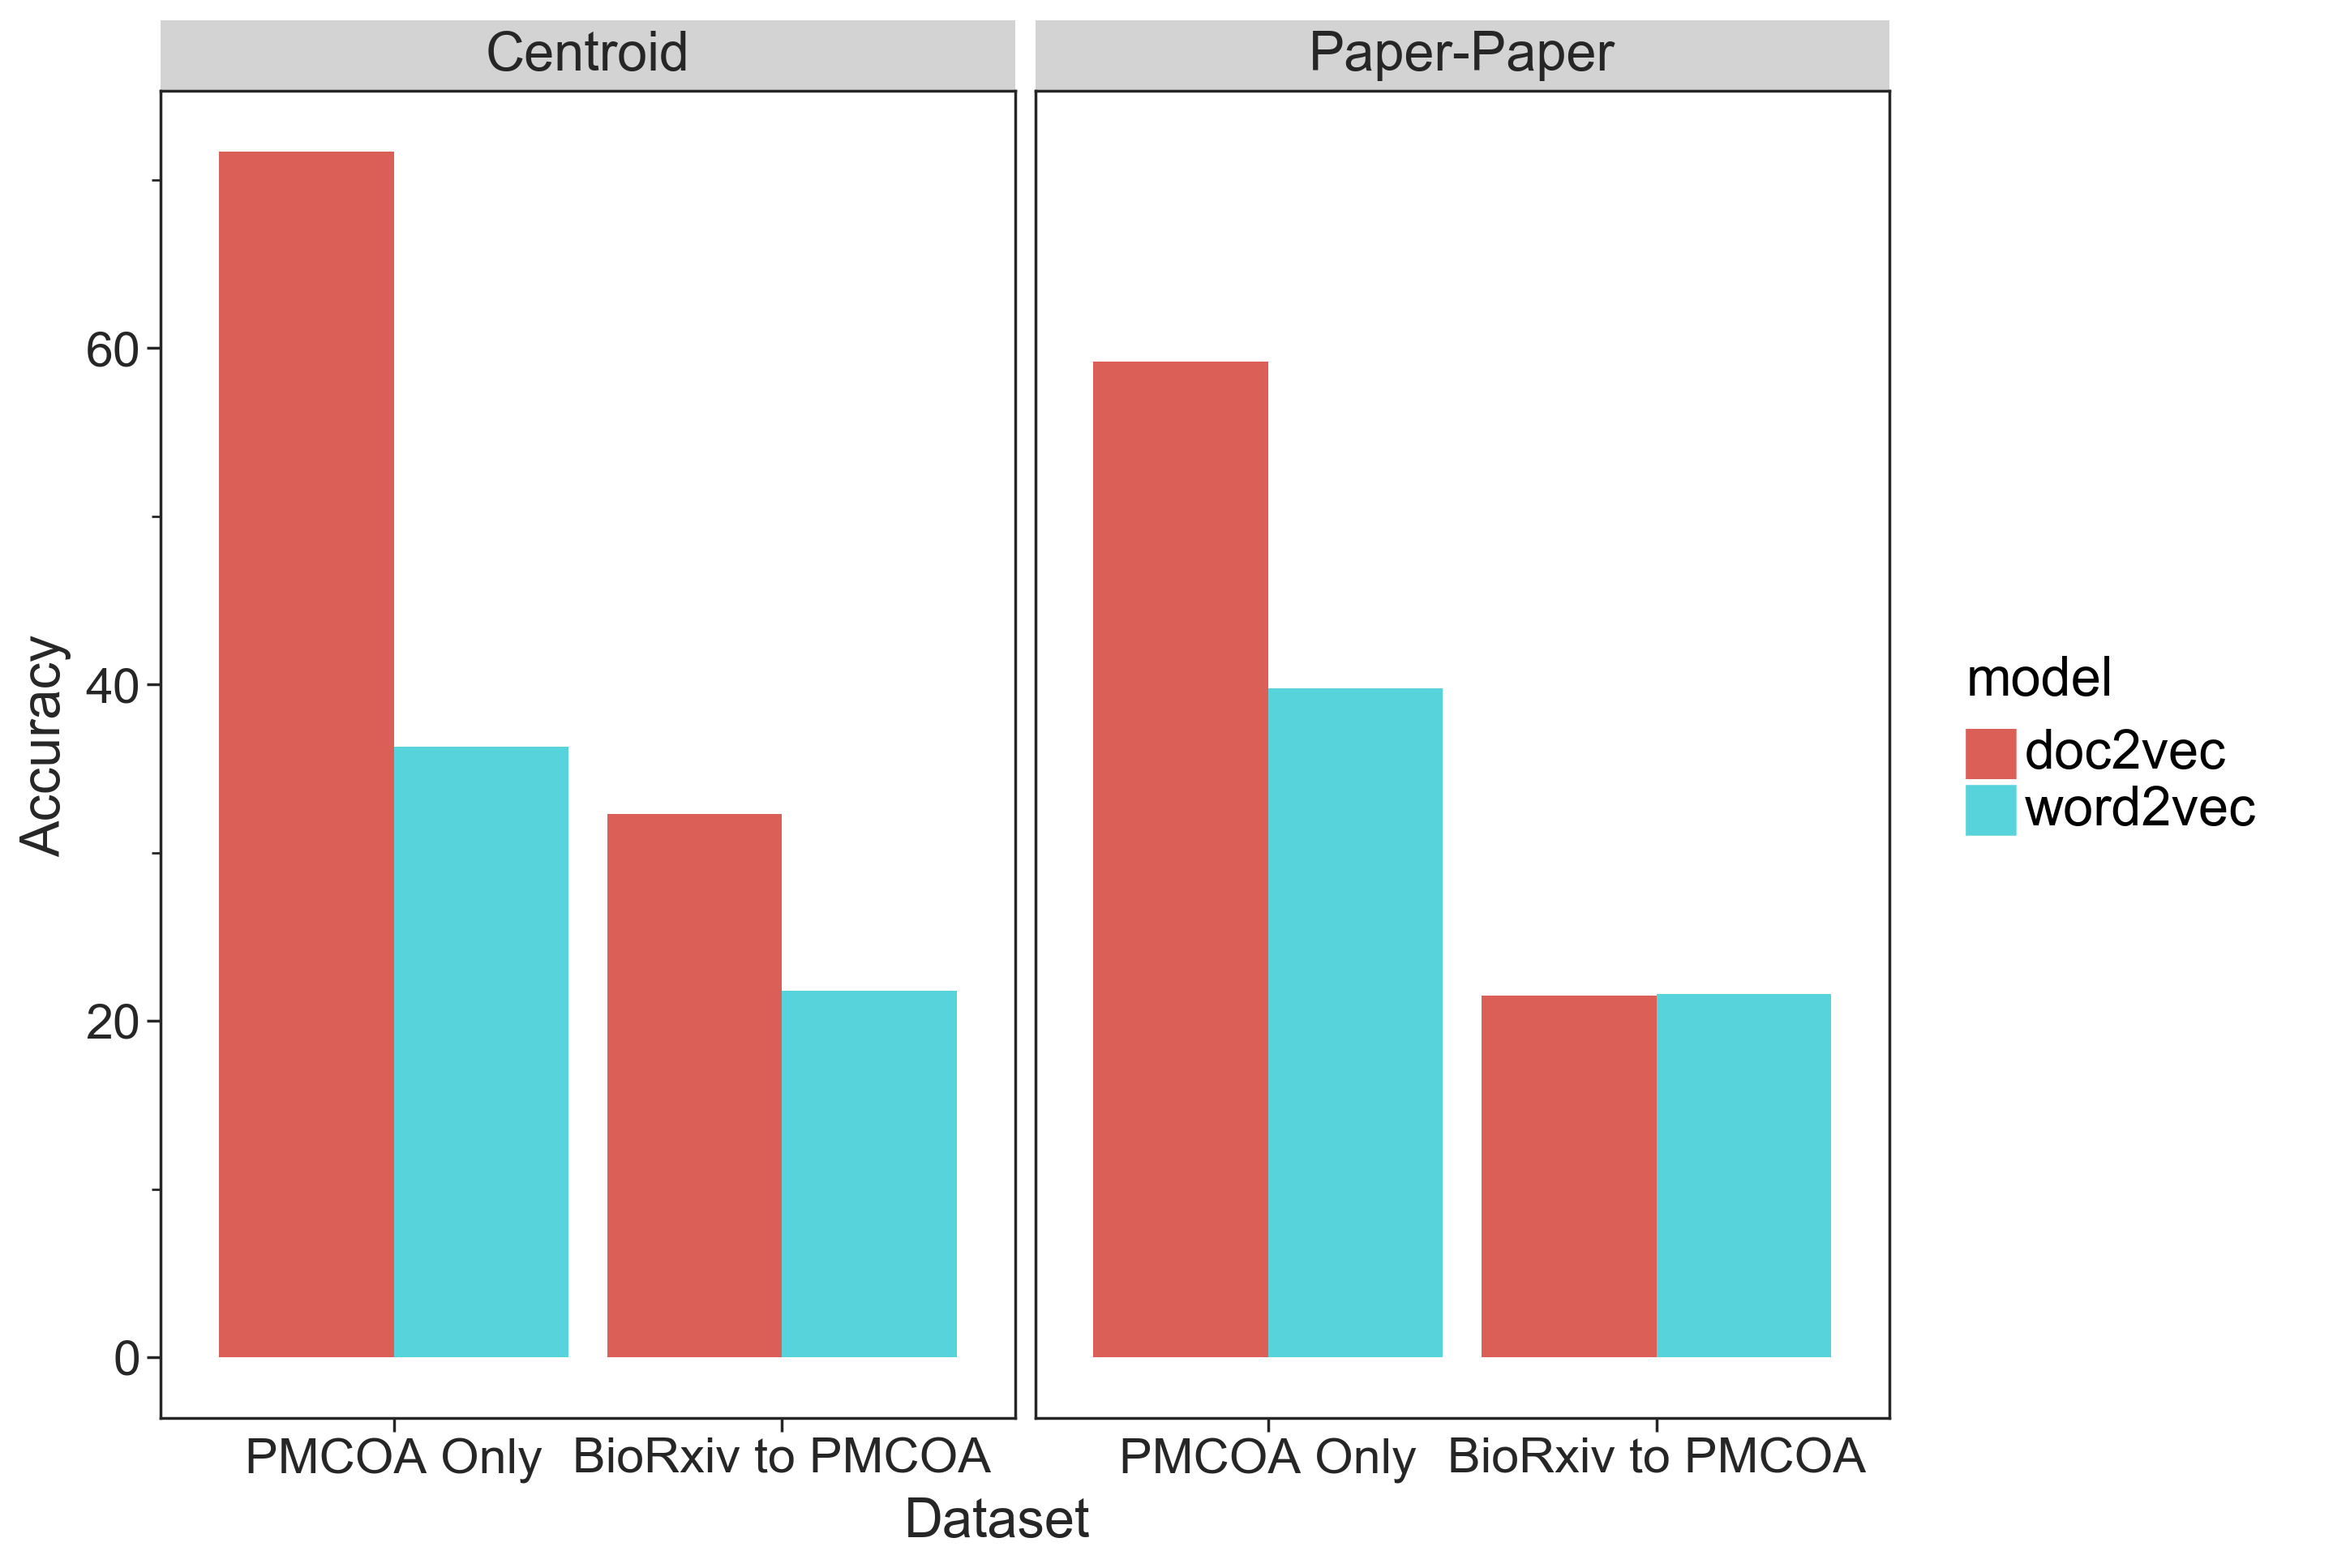 Doc2vec vs Word2vec Journal Recommendation